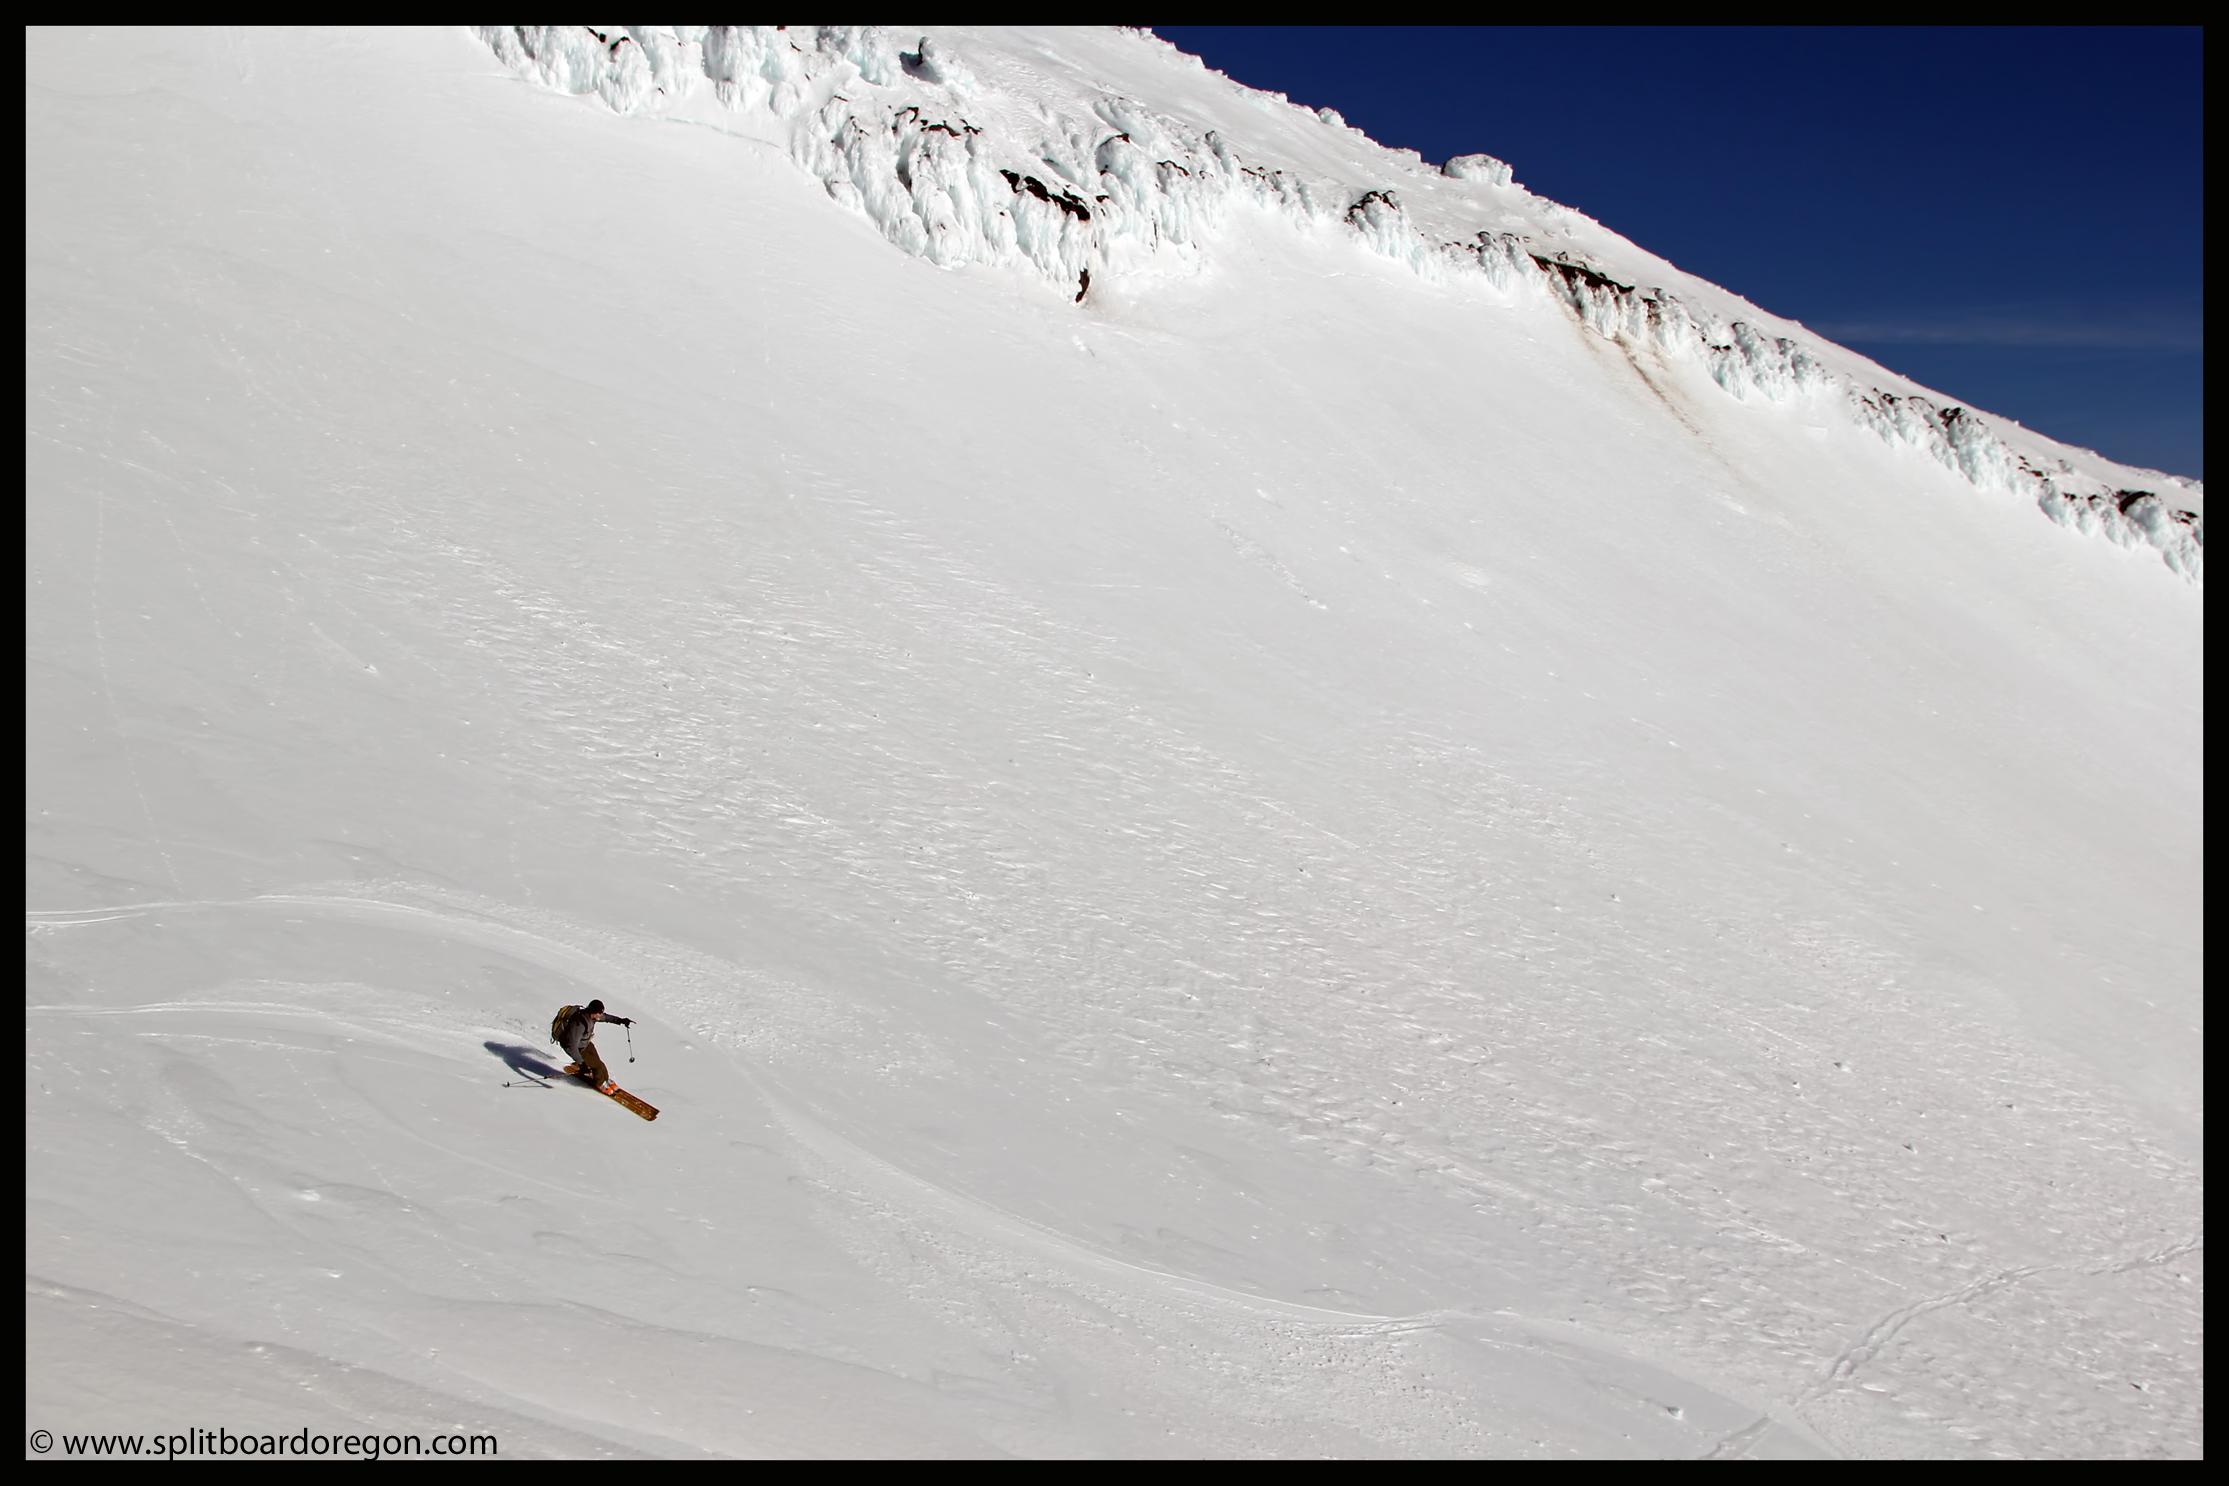 Ron cruising on the upper mountain